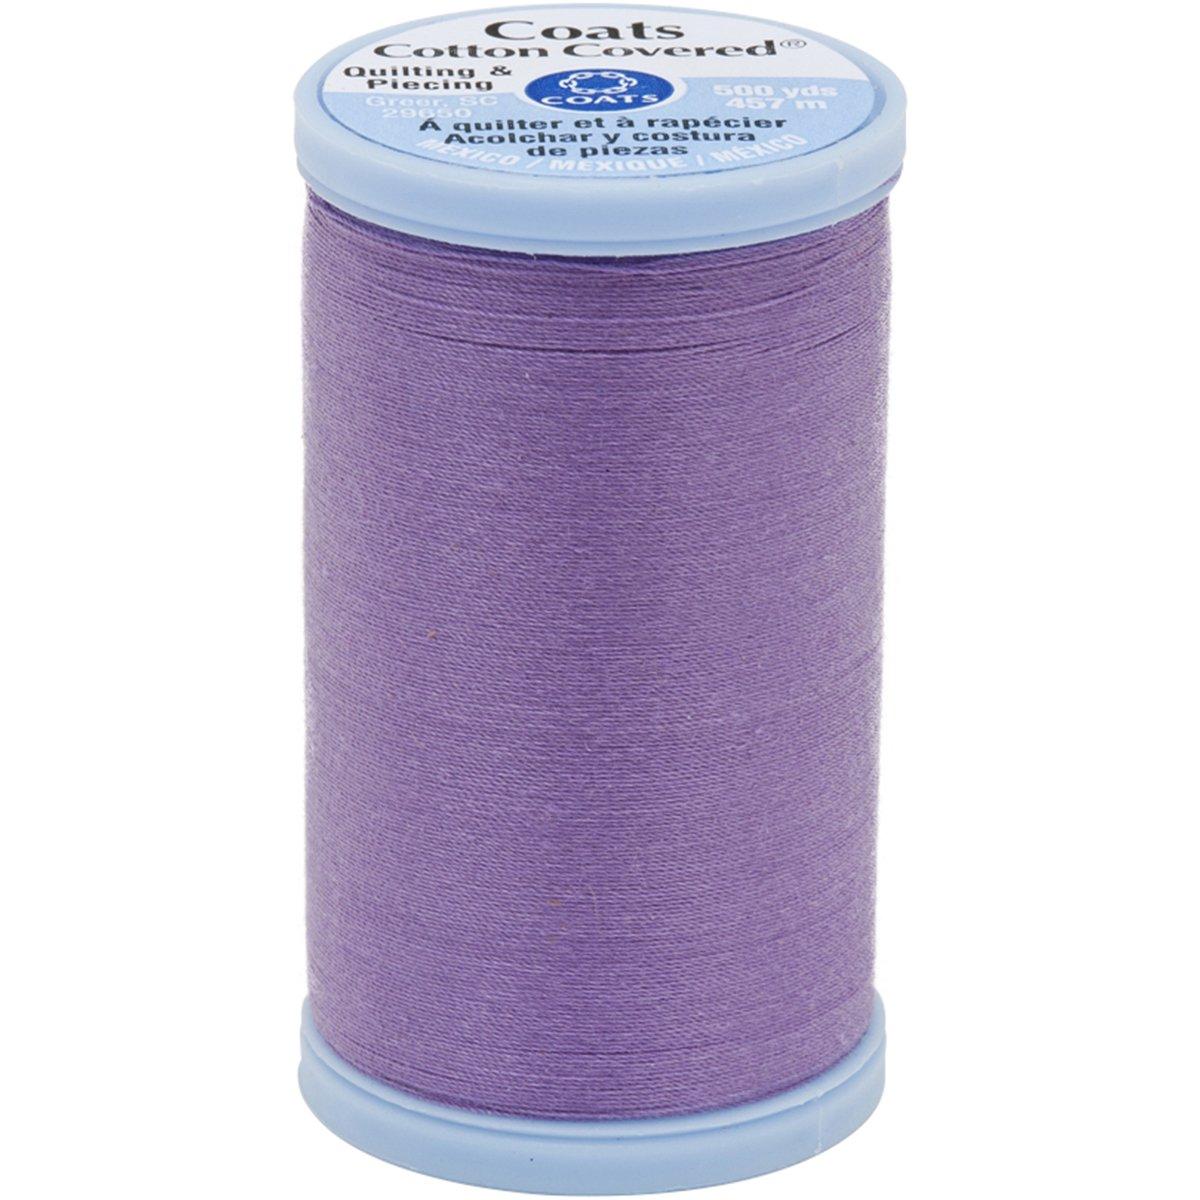 viola Coats Cotton cui Quilting e Piecing Thread Yard 500 colore